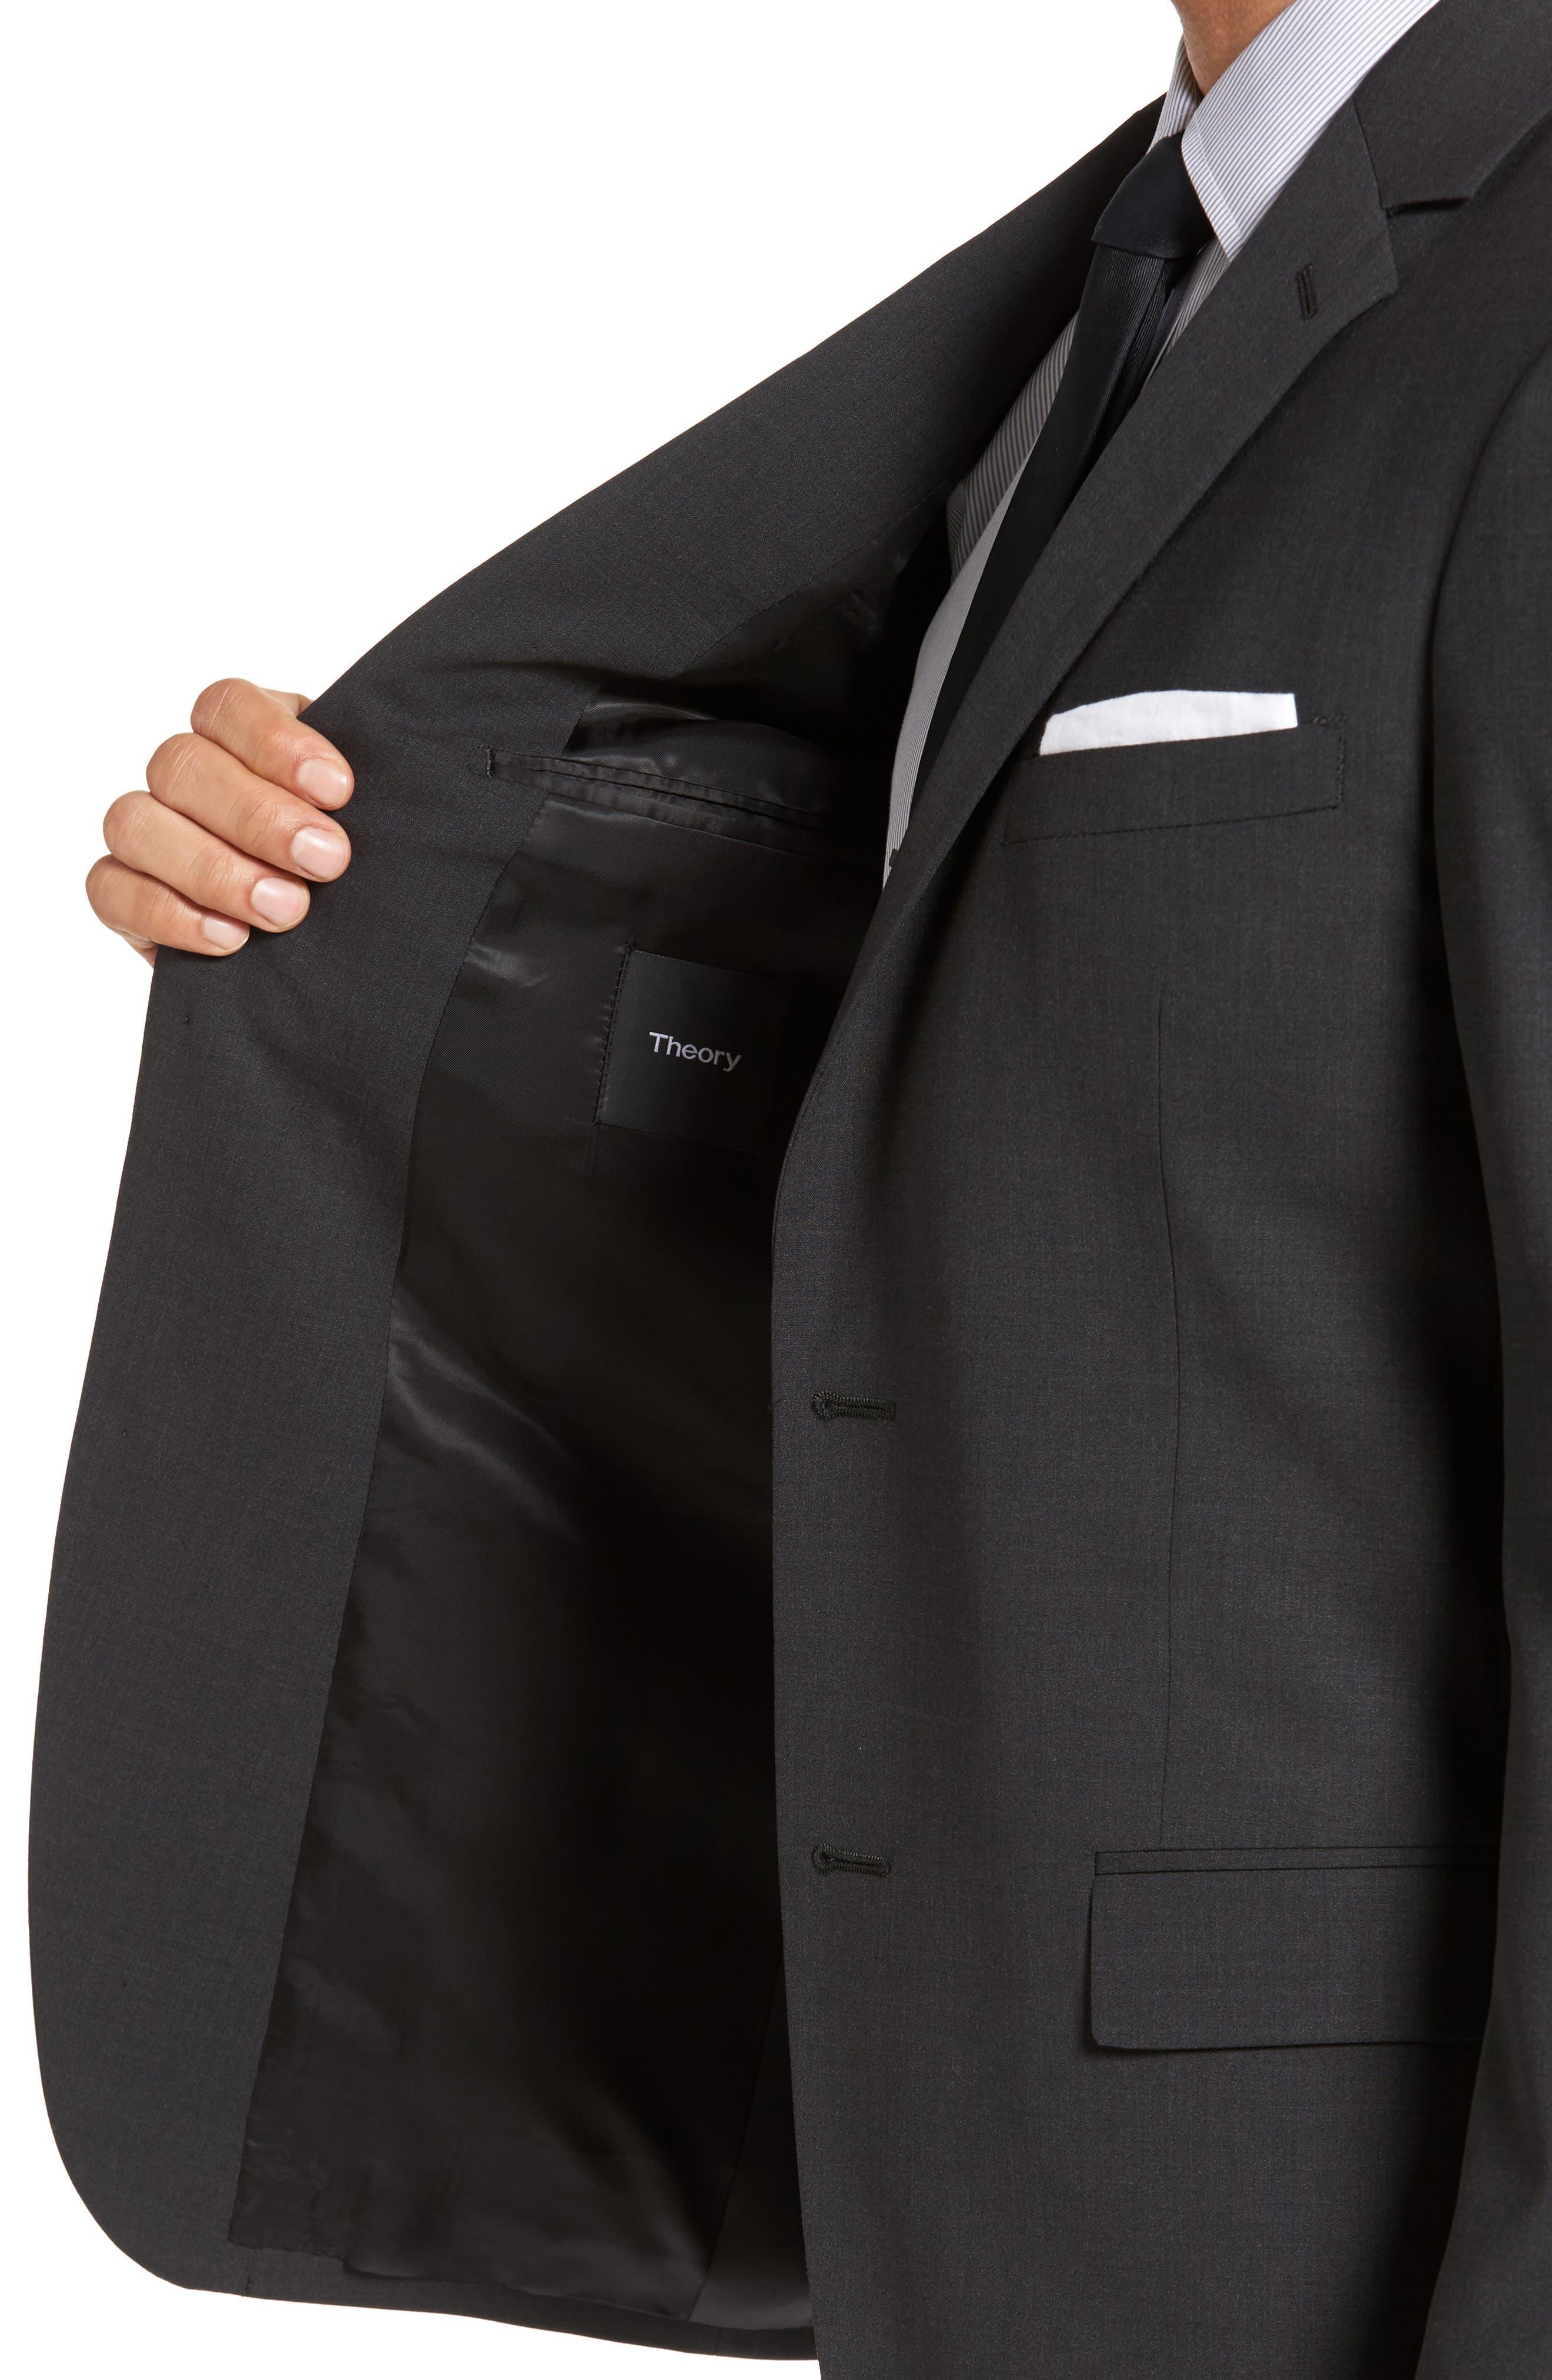 Wellar New Tailor 1 Trim Fit Stretch Wool Sport Coat,                             Alternate thumbnail 4, color,                             Dark Charcoal